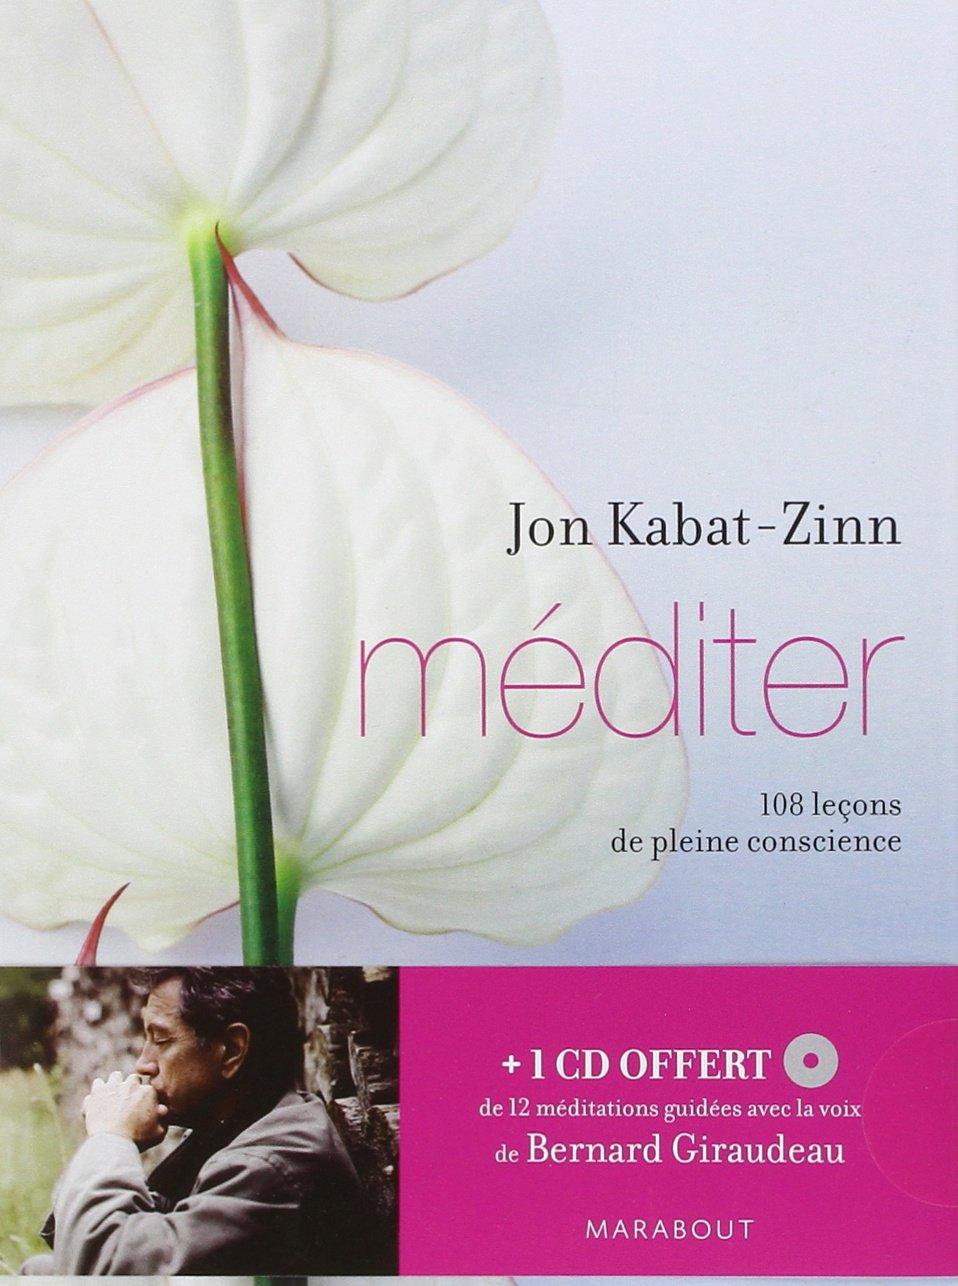 Méditer : 108 leçons de pleine conscience - Jon Kabat-Zinn - Editions Marabout